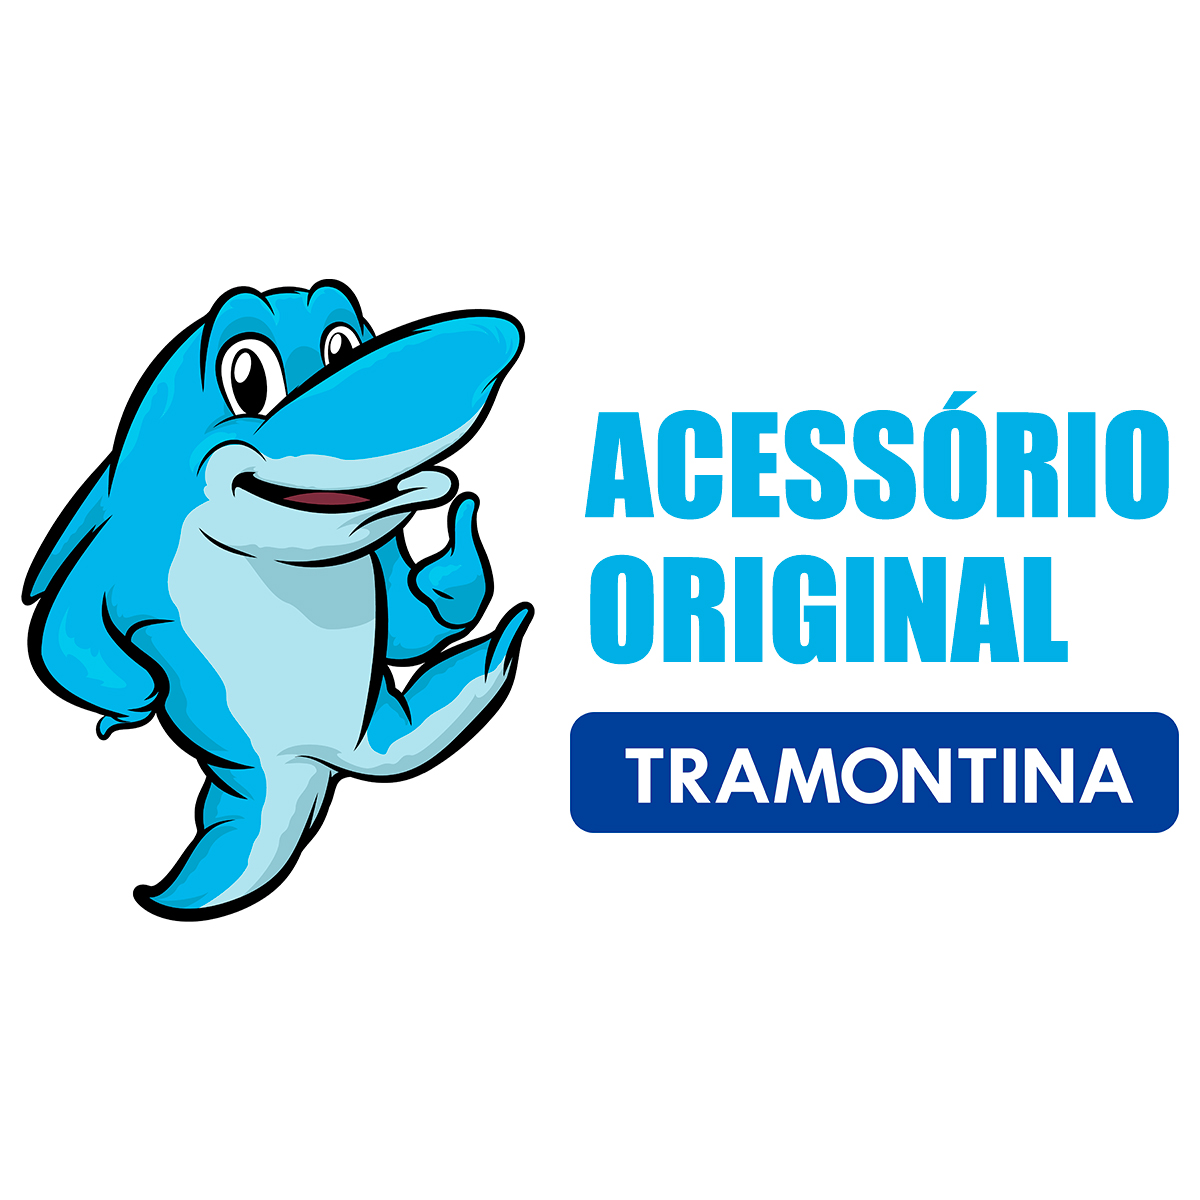 Mangueira para Lavadora Tramontina 1900psi 1800w, 1600psi 1400w, 1500psi 1200w com 5 metros Original